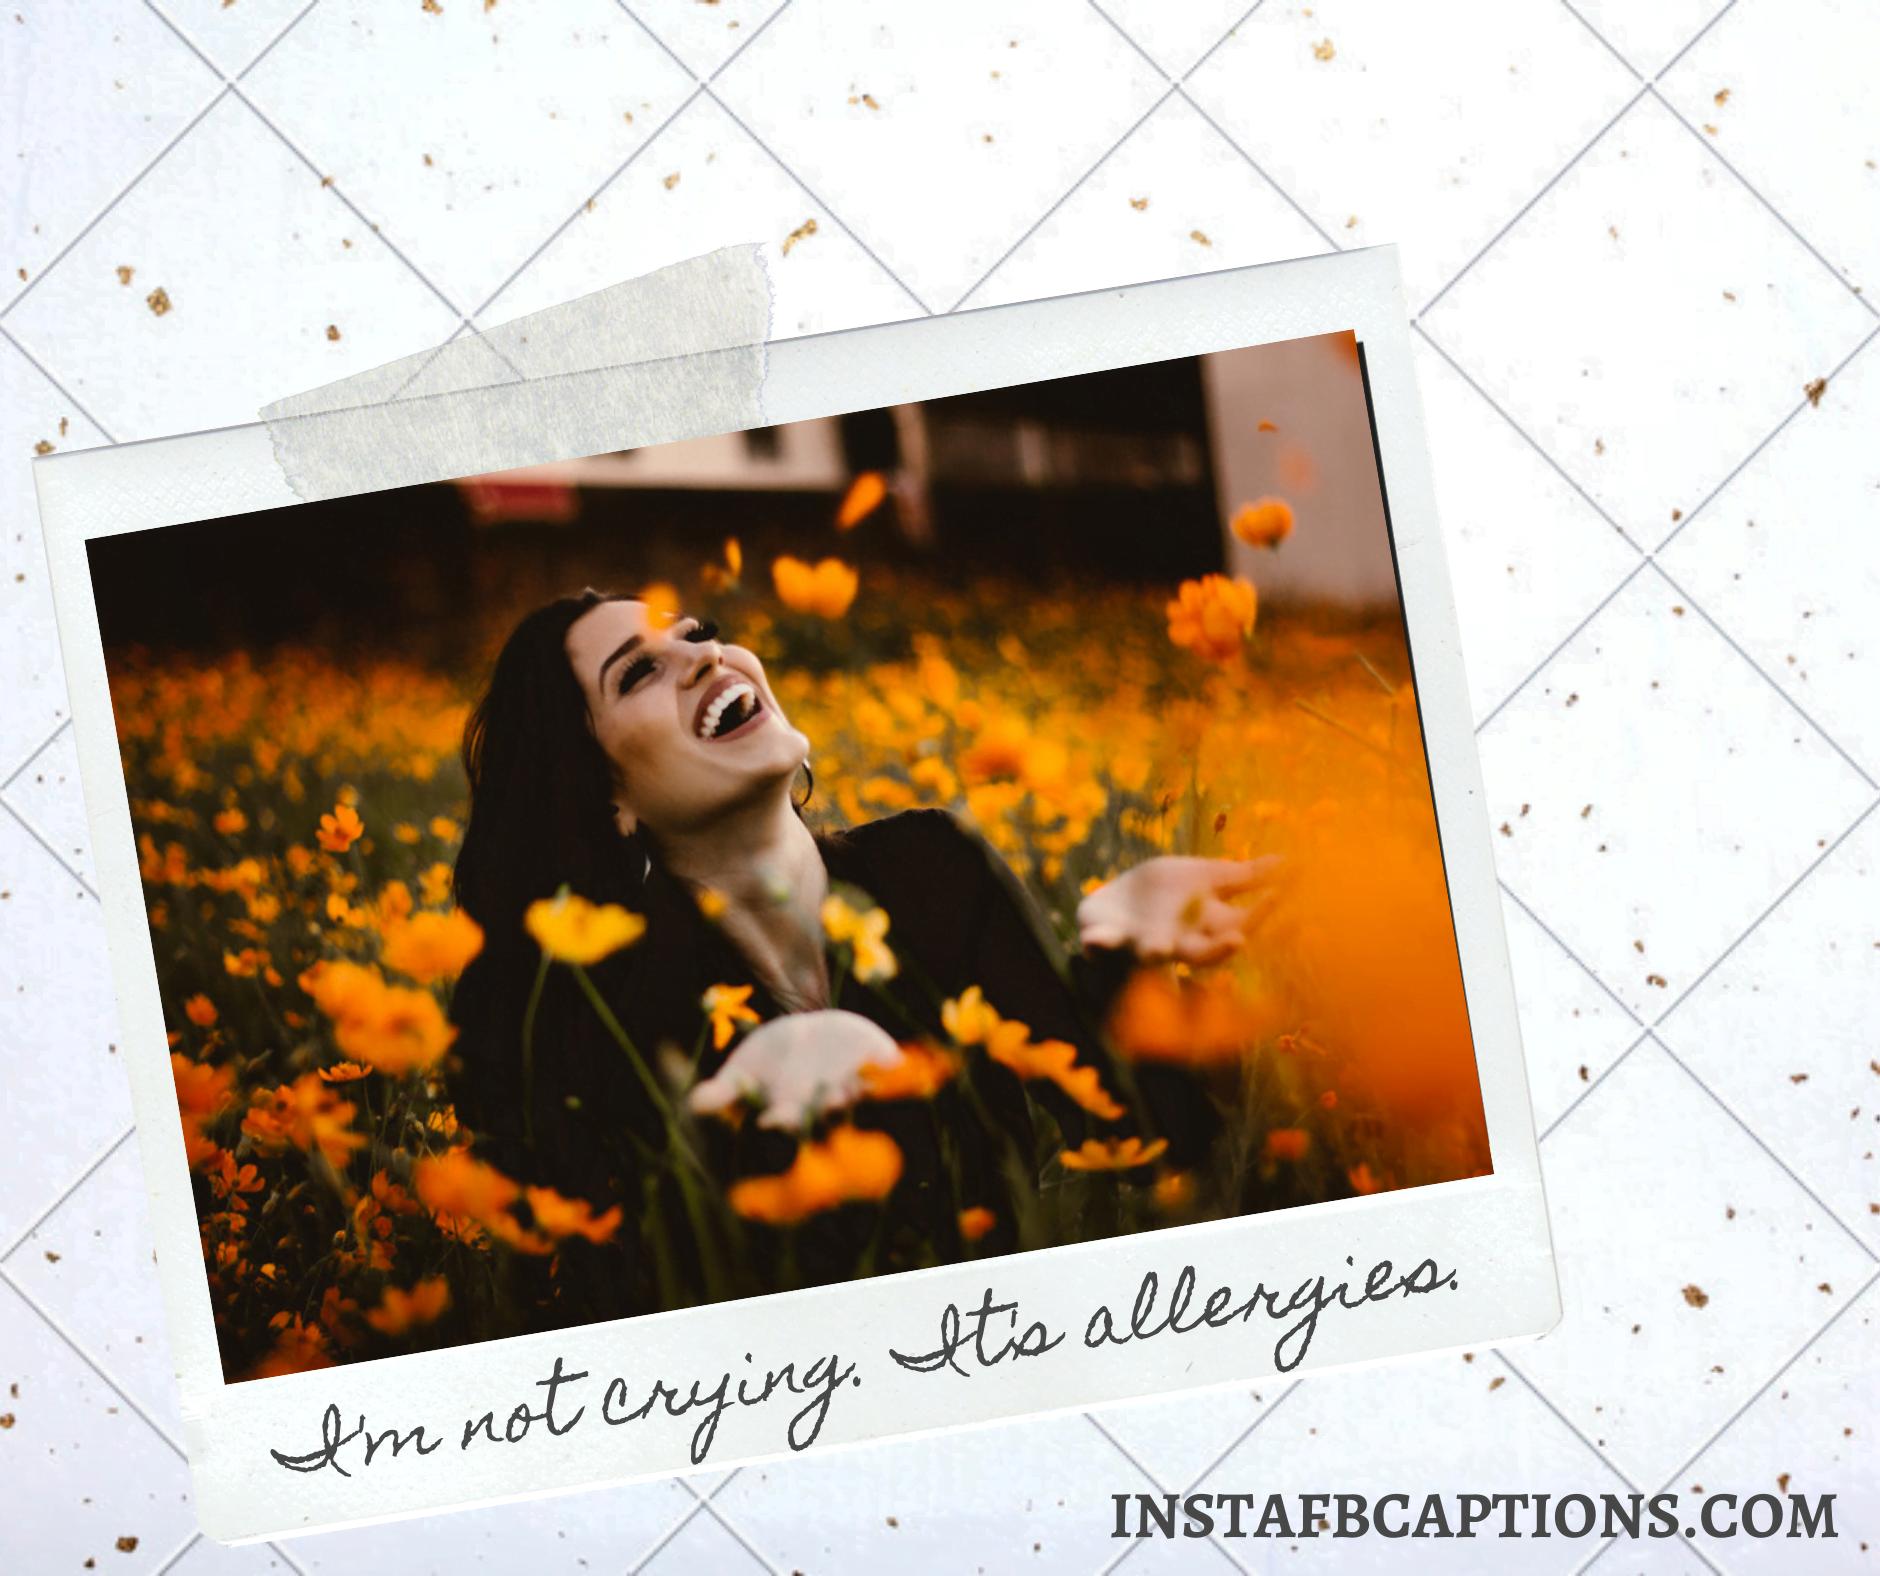 Funny Spring Captions  - Funny Spring Captions - 150+ Best SPRING Instagram Captions 2021